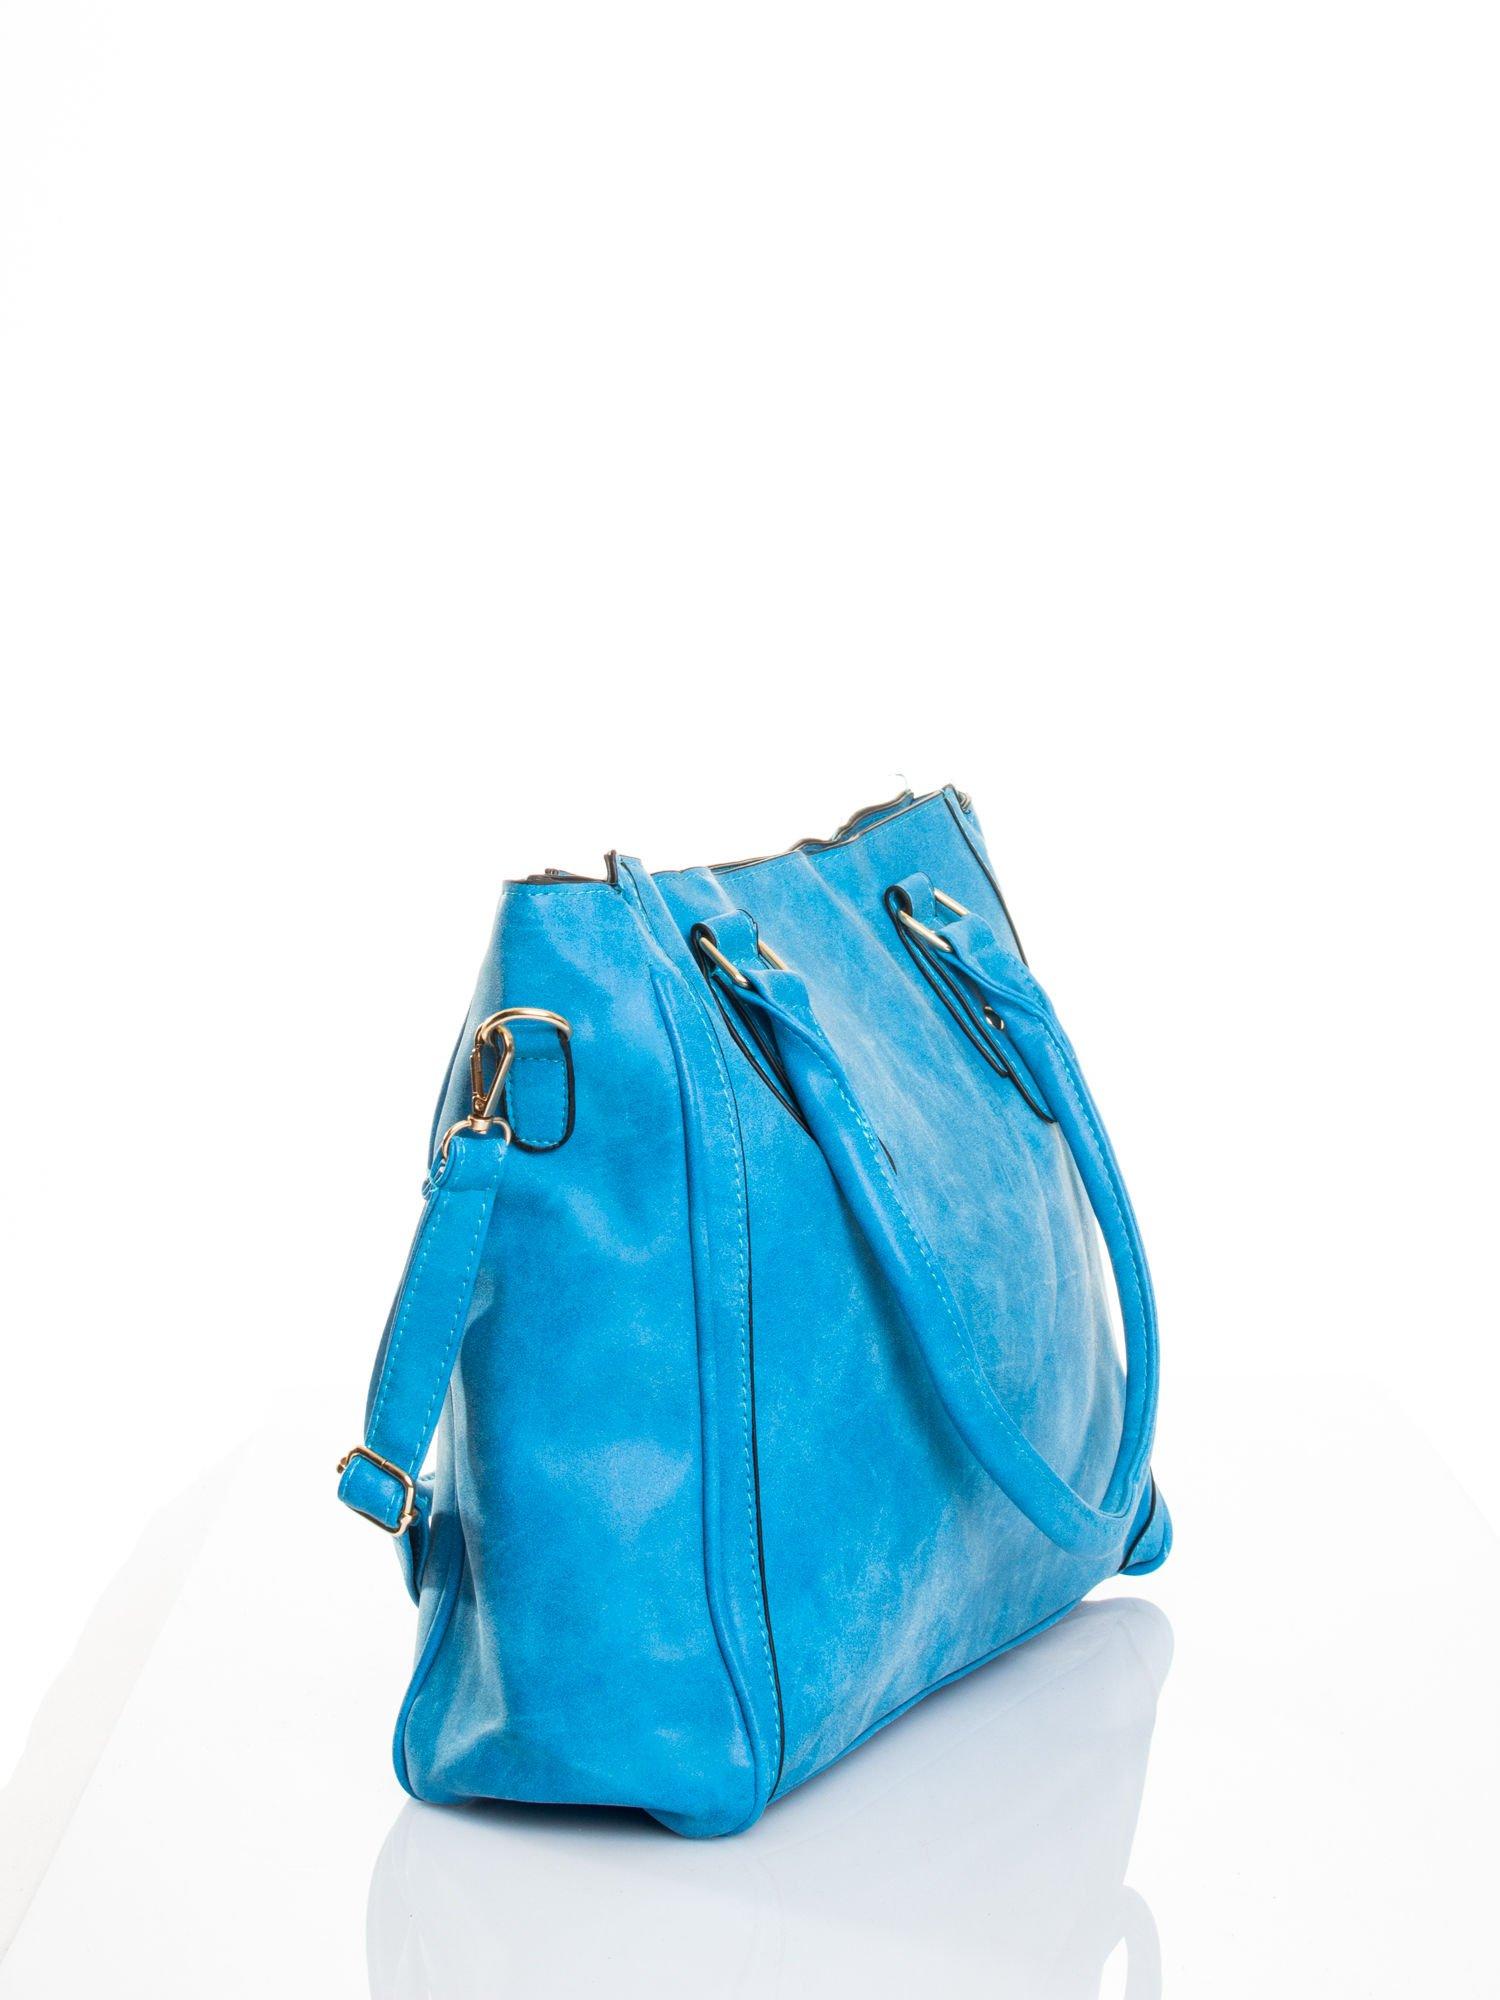 Niebieska torebka miejska                                  zdj.                                  3